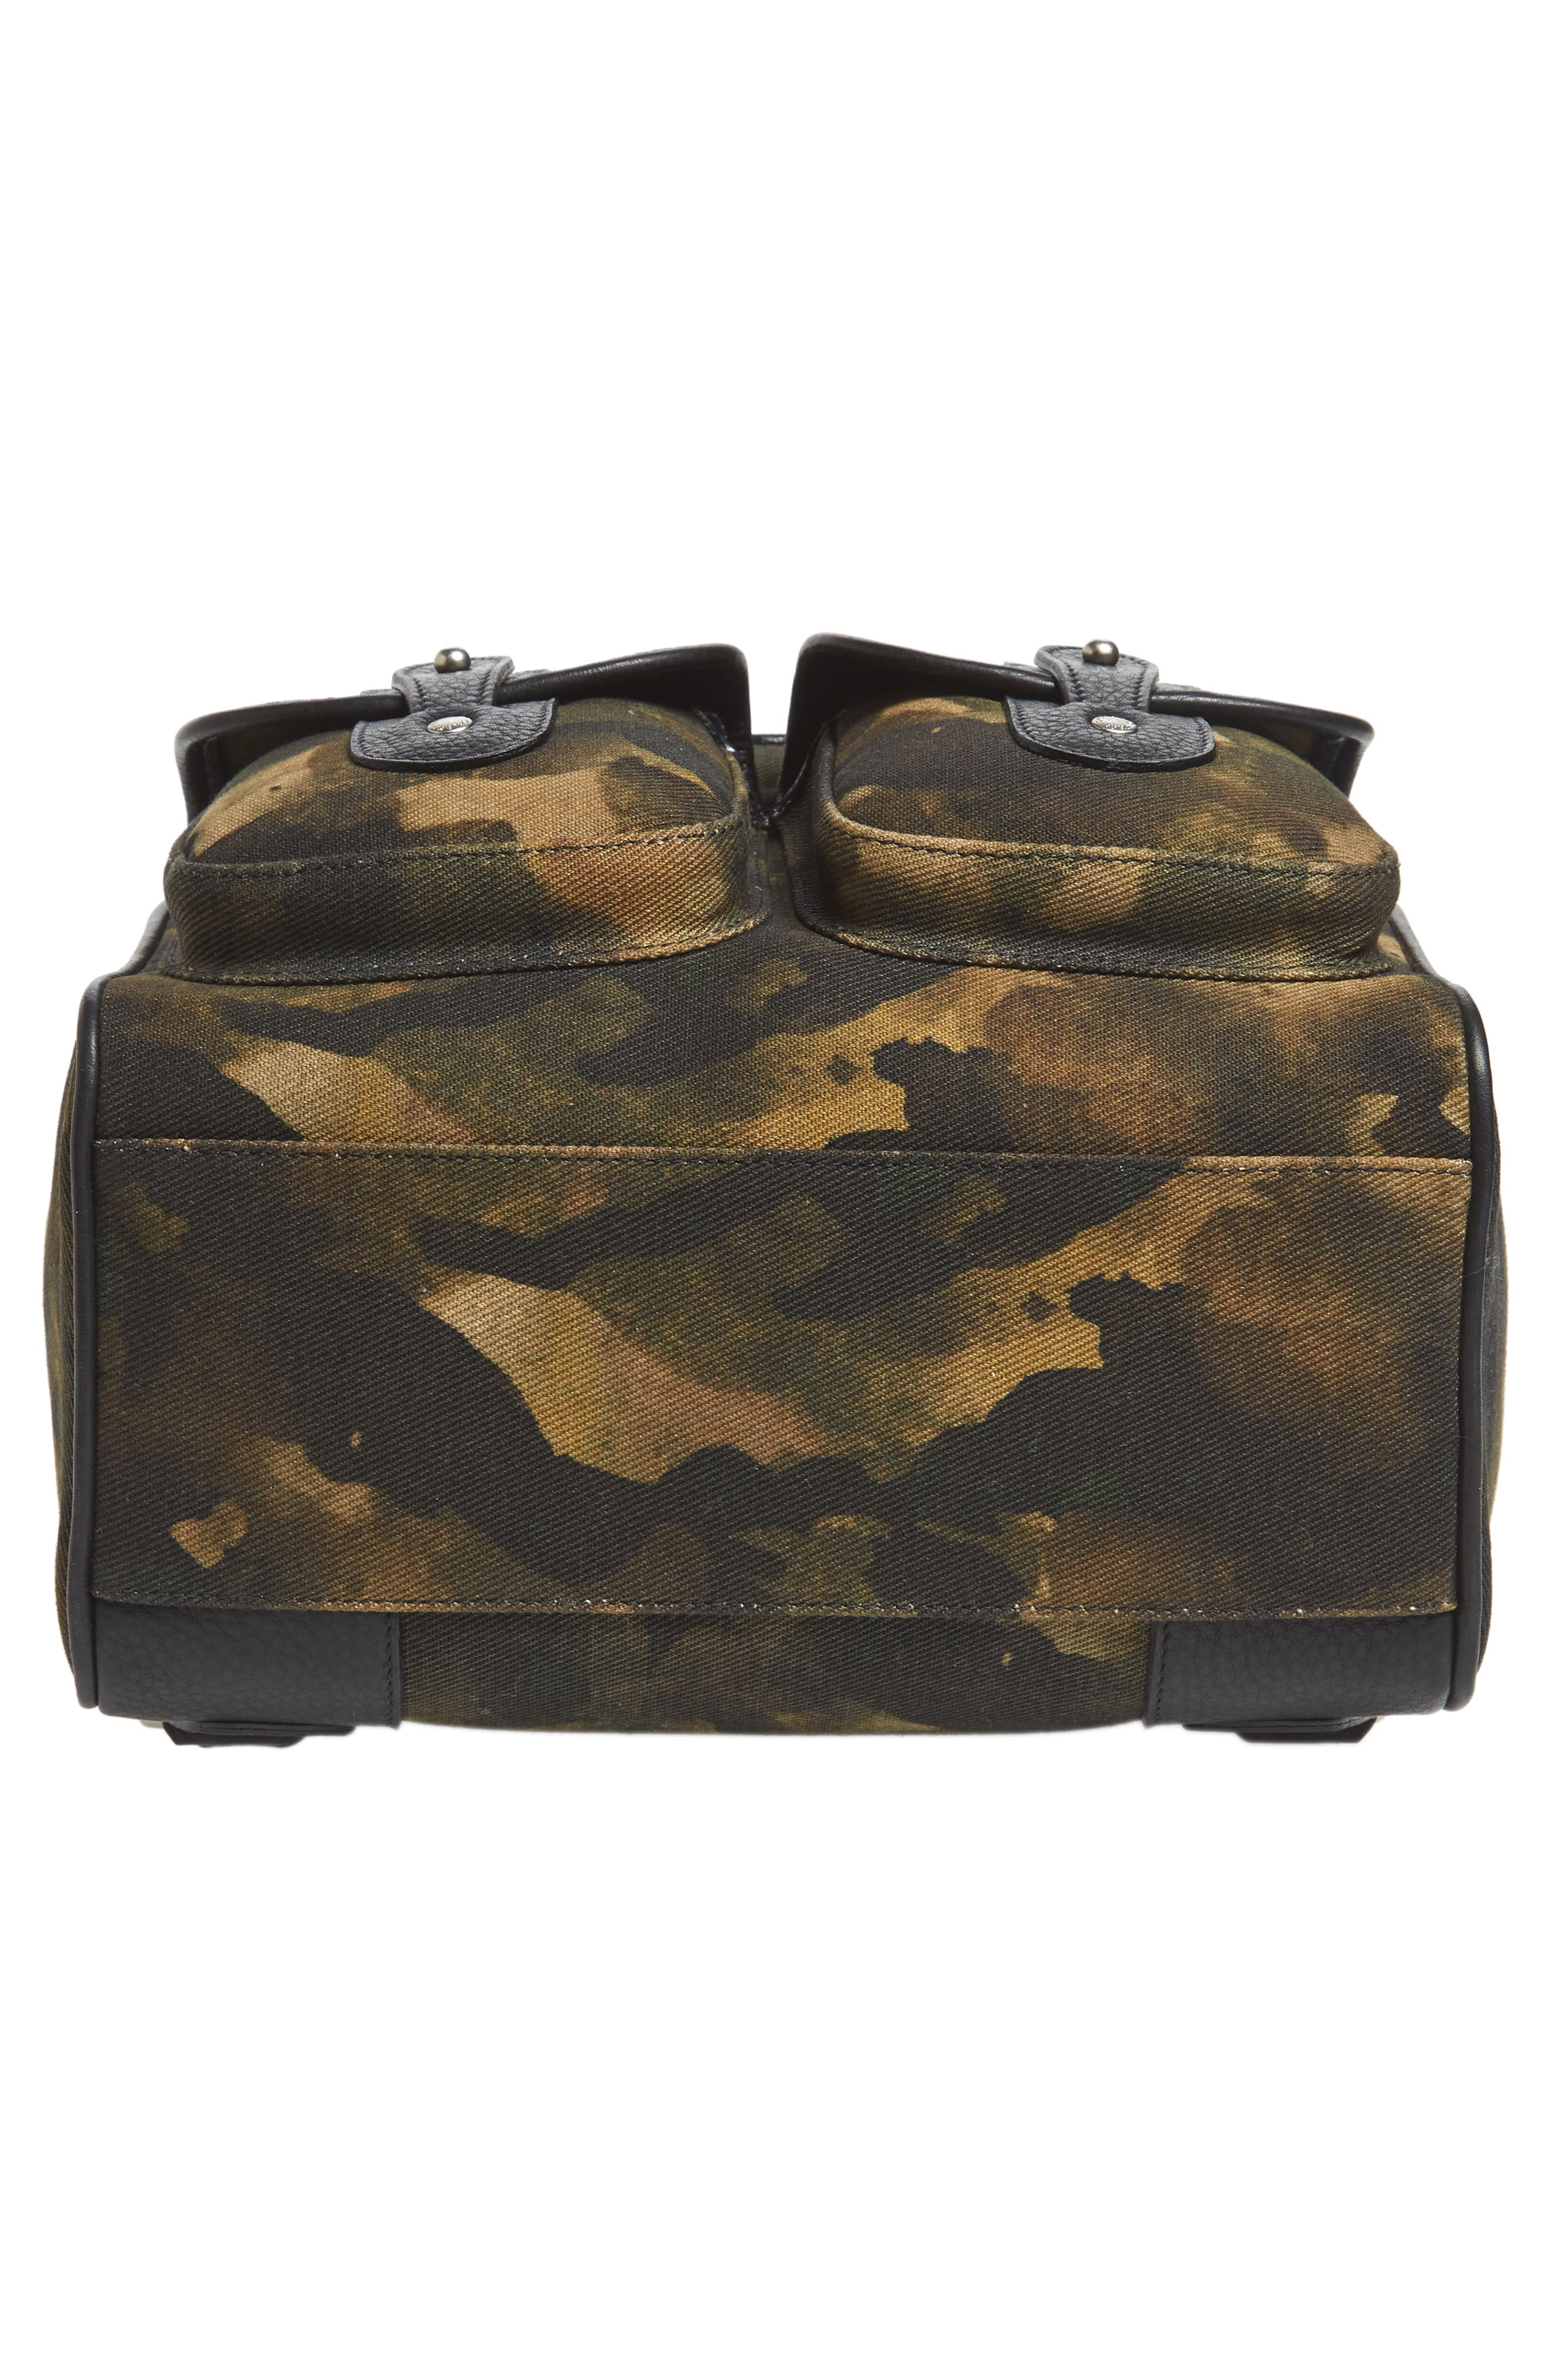 Blazer Canvas Backpack,                             Alternate thumbnail 6, color,                             350